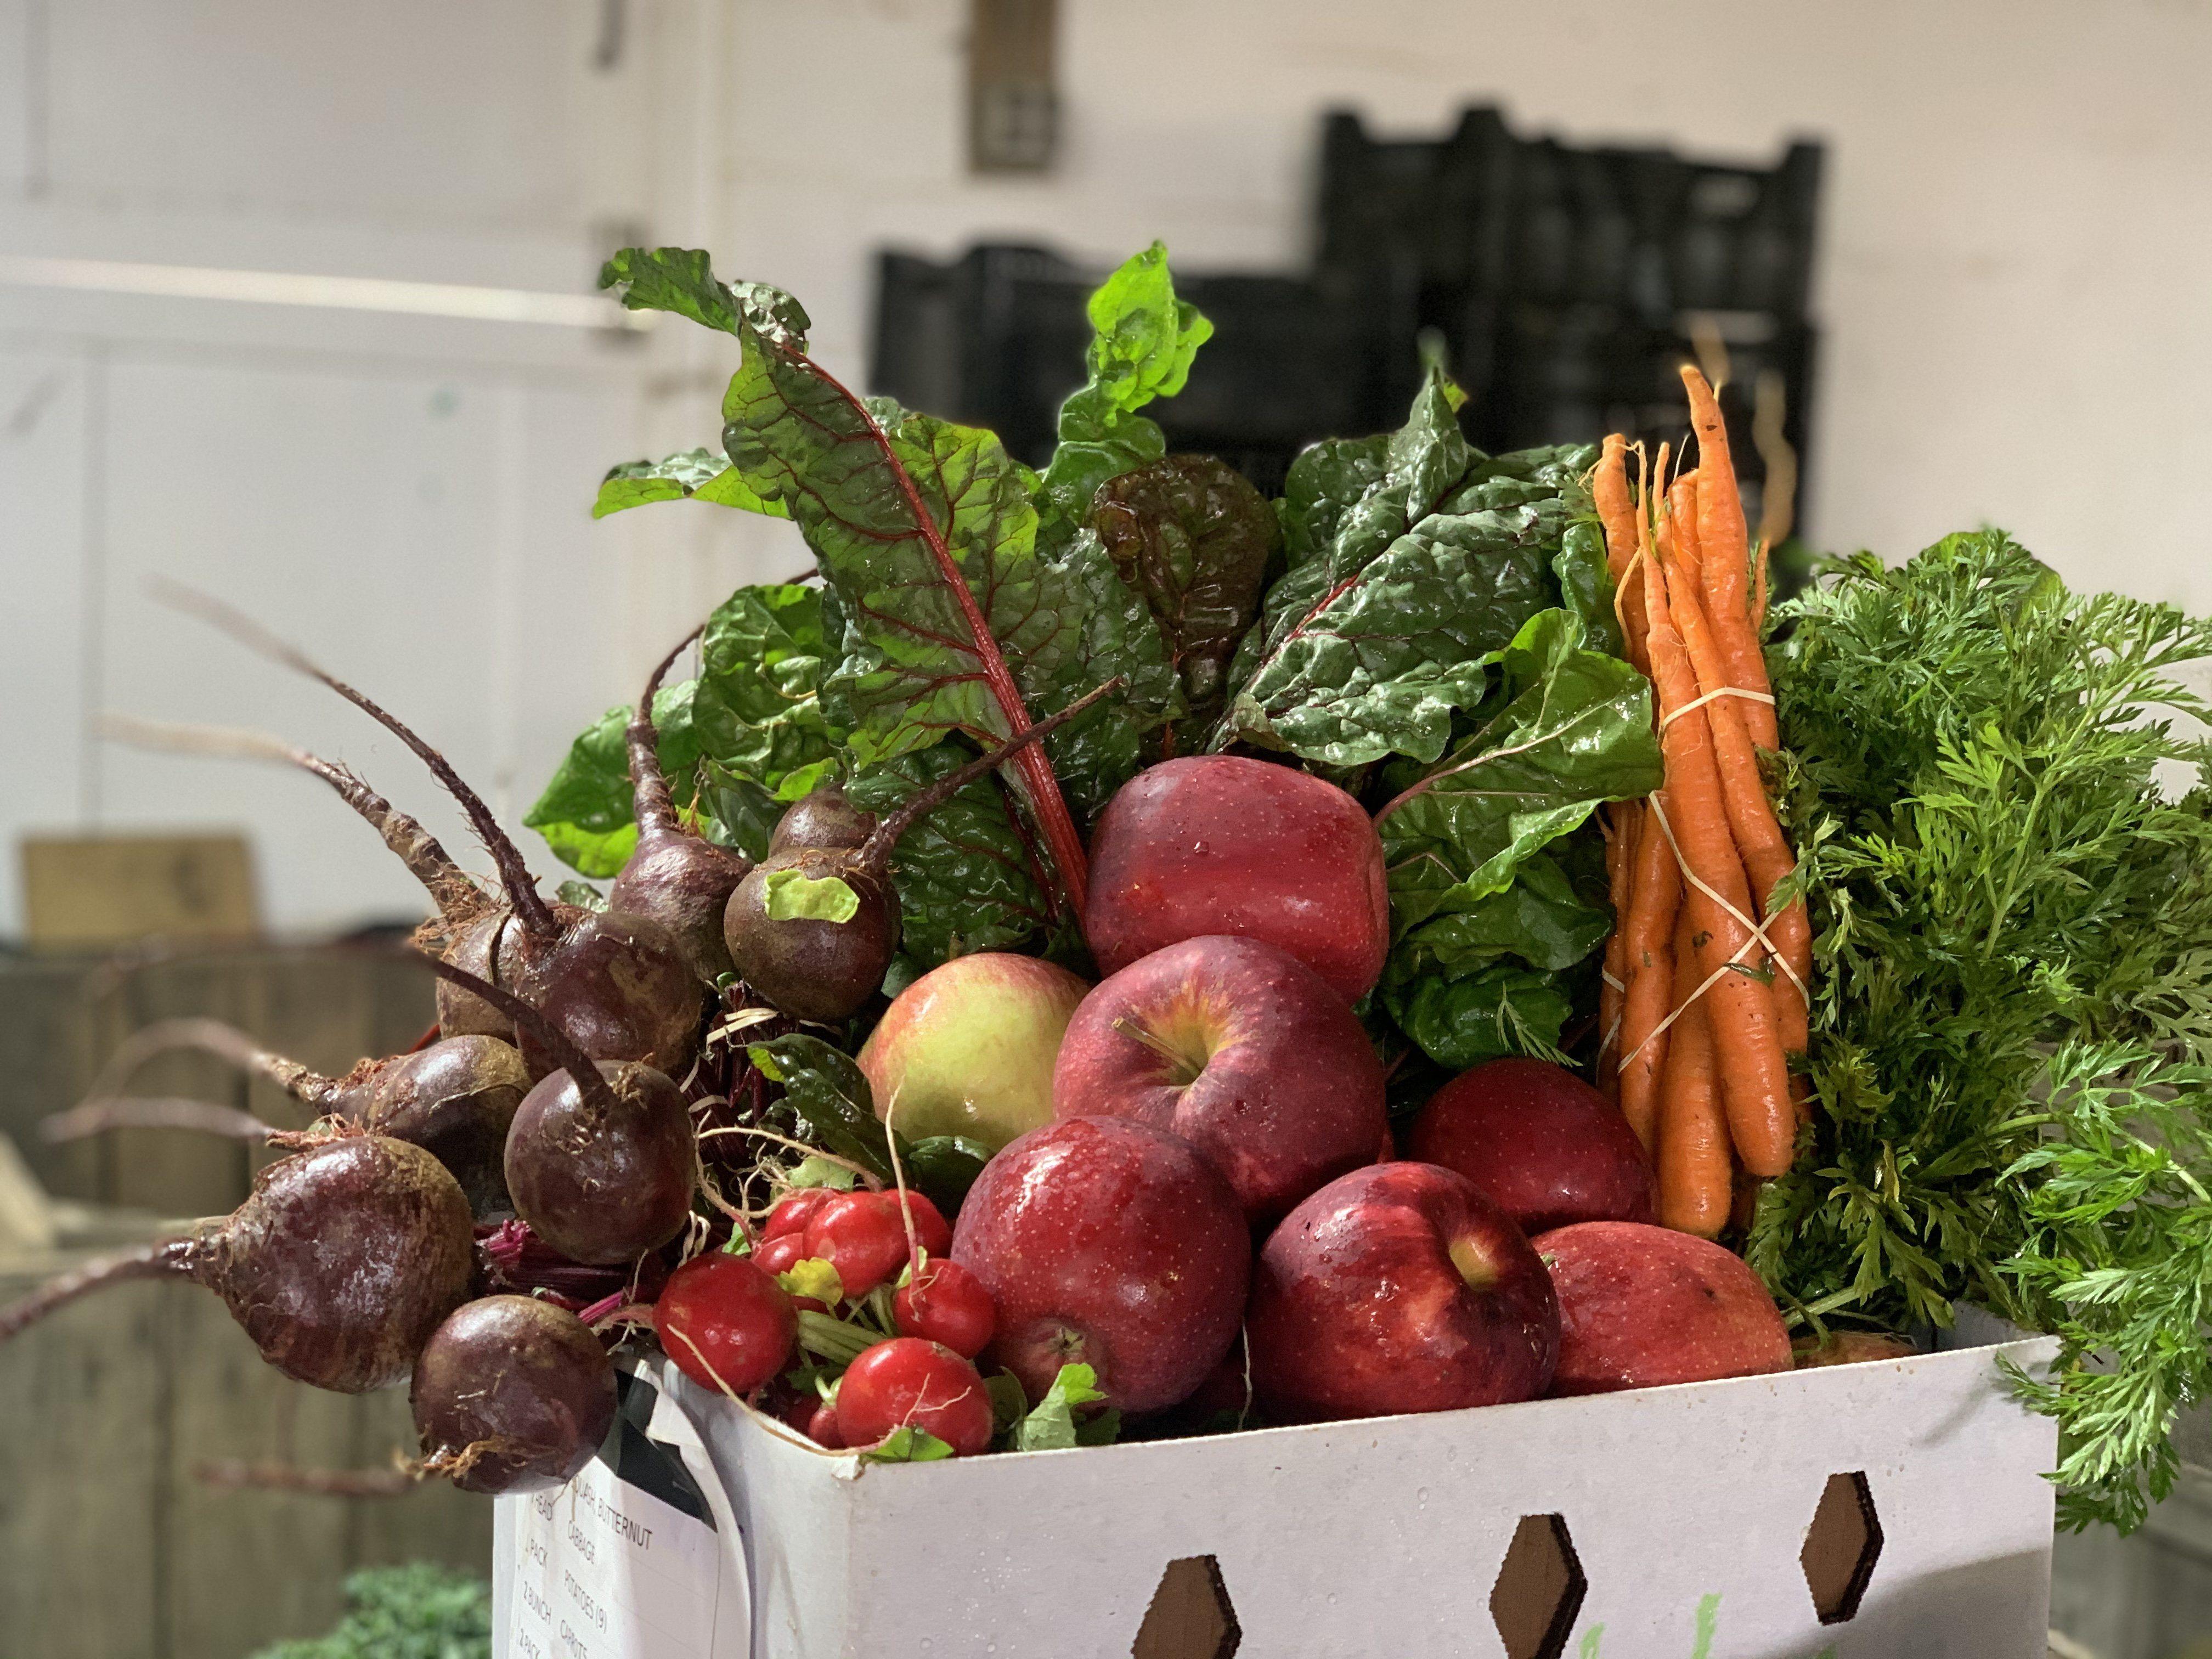 Previous Happening: Holiday Harvest Week 3